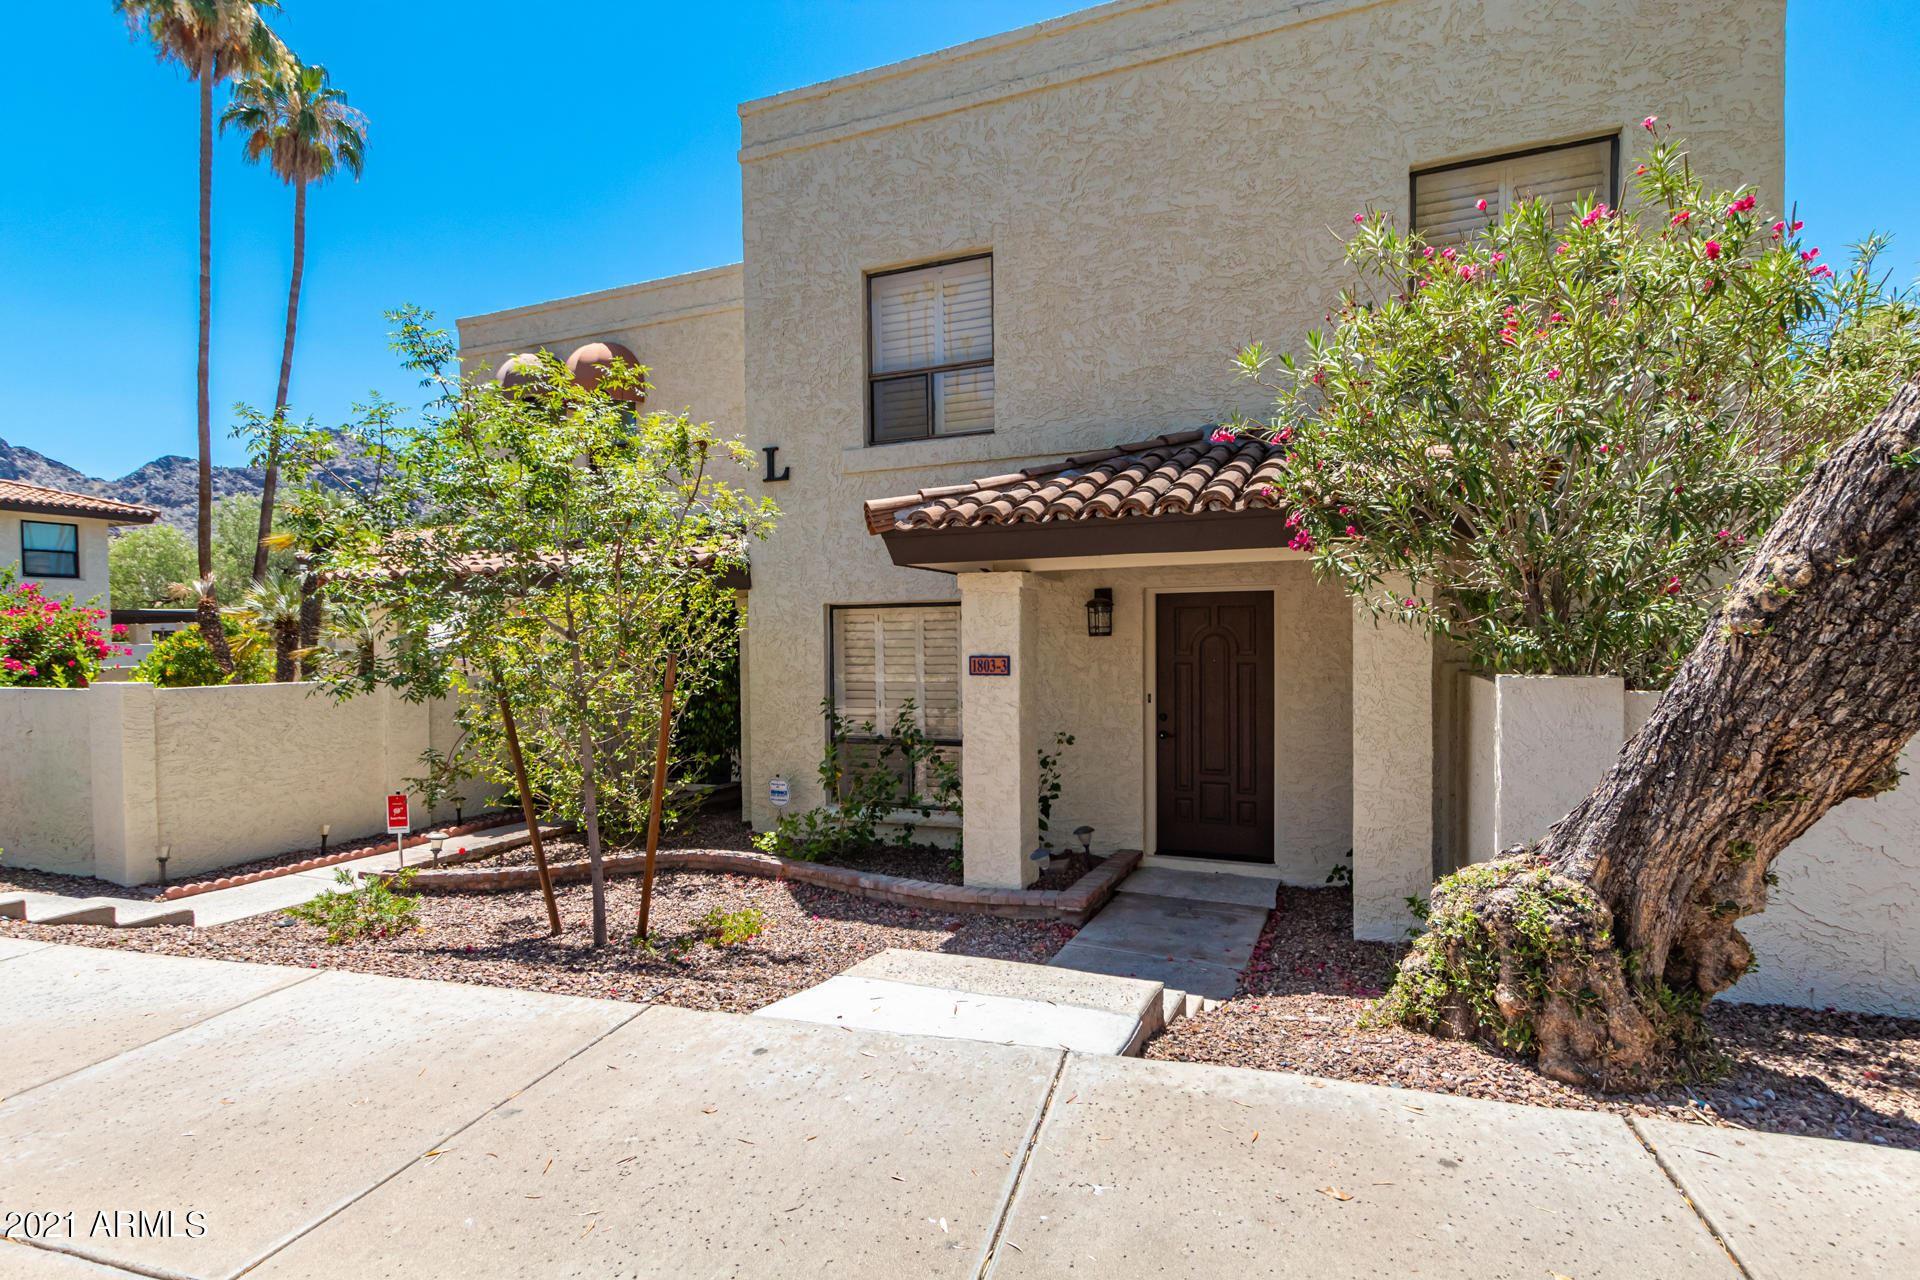 Photo of 1803 E HAYWARD Avenue #3, Phoenix, AZ 85020 (MLS # 6238676)